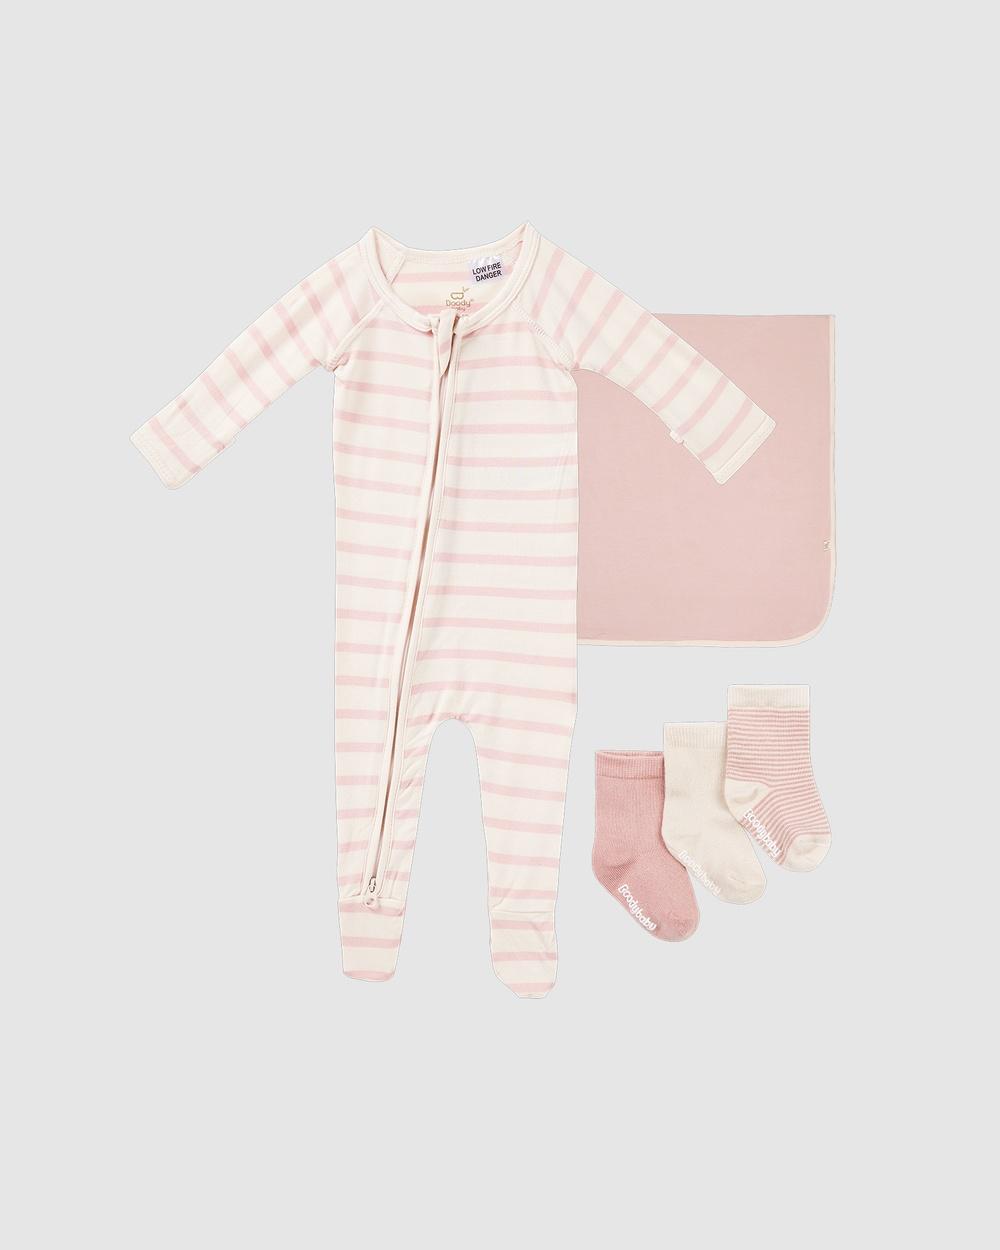 Boody Everything Bub Needs Gift Set 3 Items Wraps & Blankets Rose/Rose Stripe